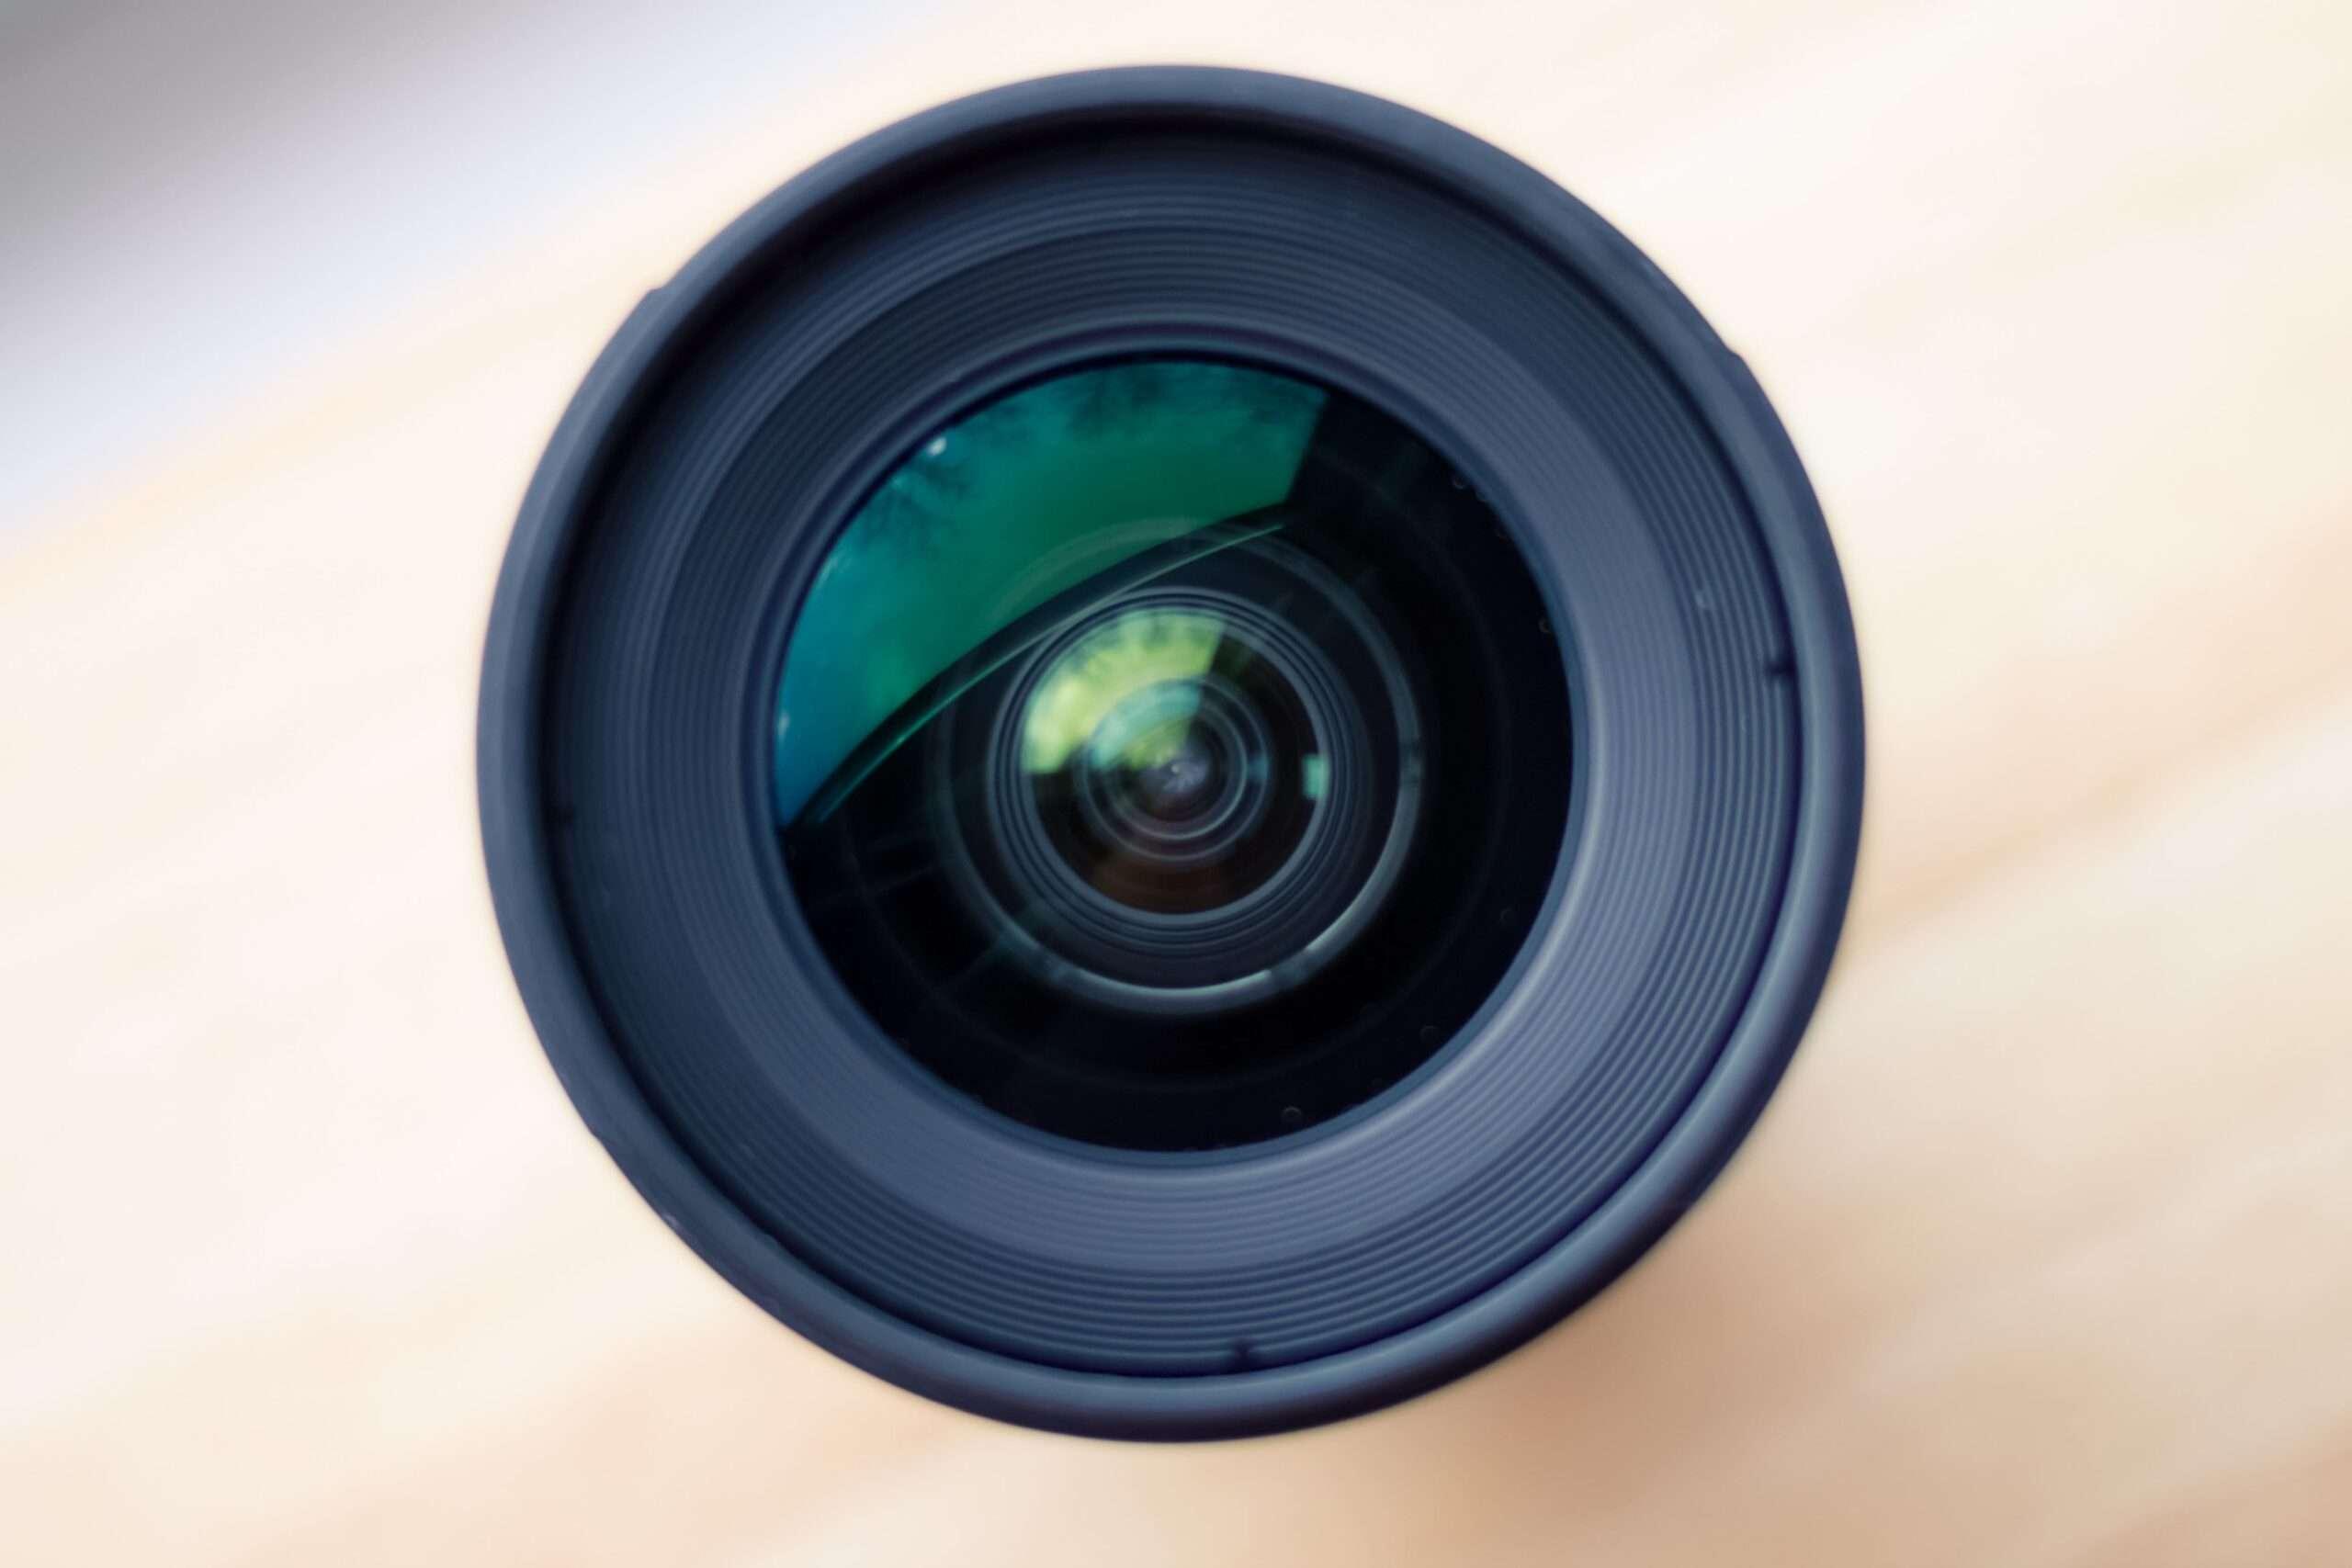 3D Camera Technology